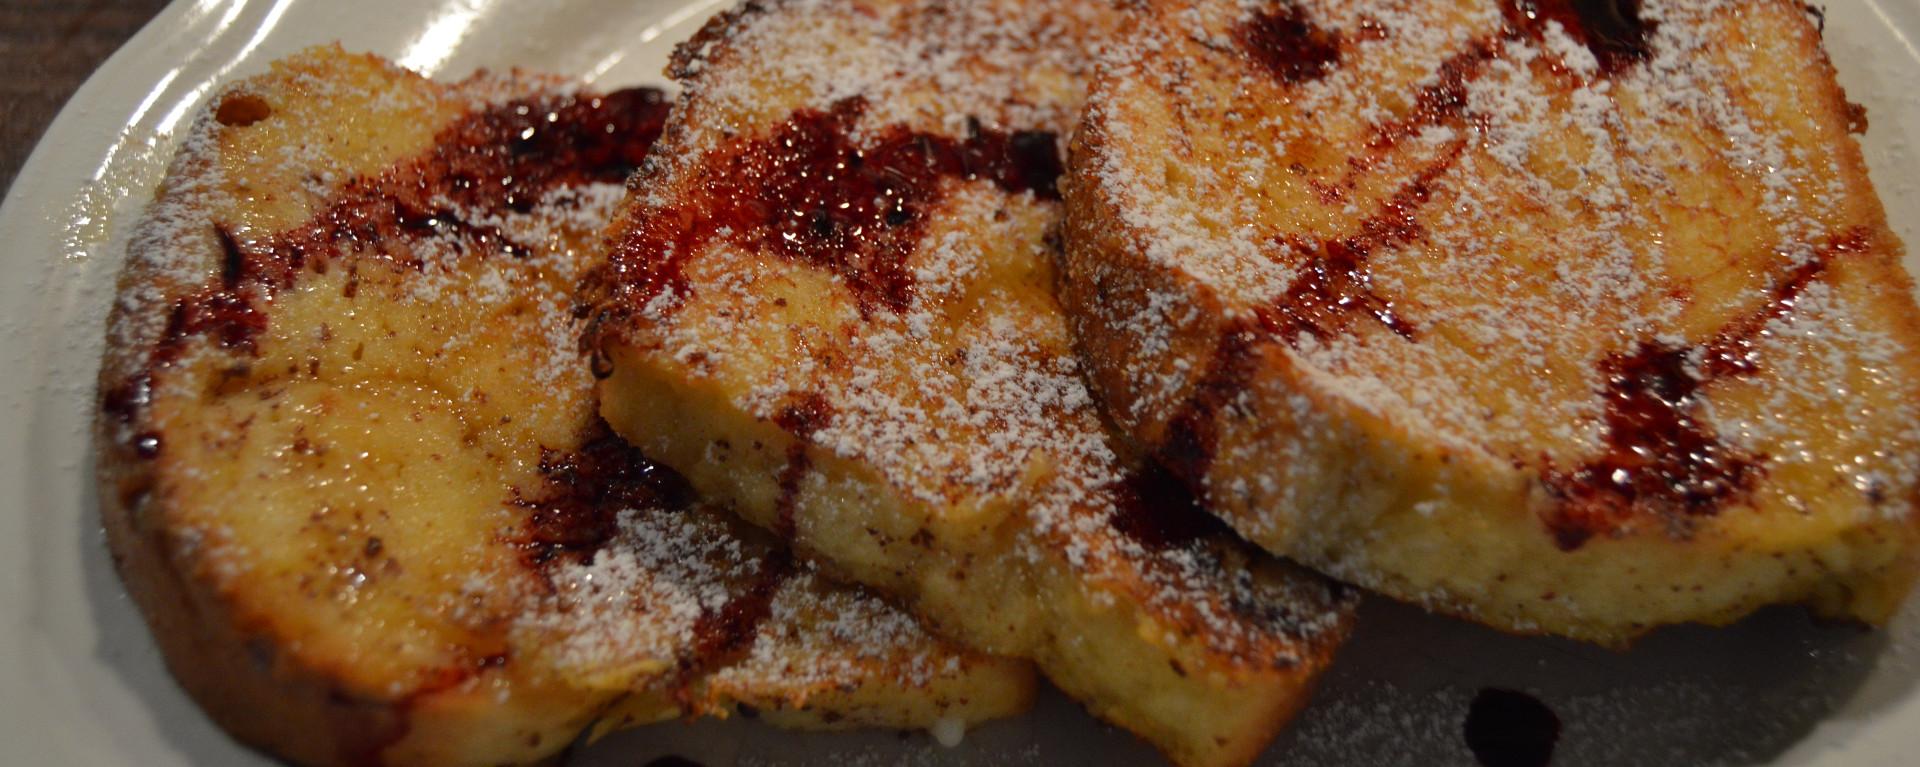 ChefNorway's Norwegian Toast